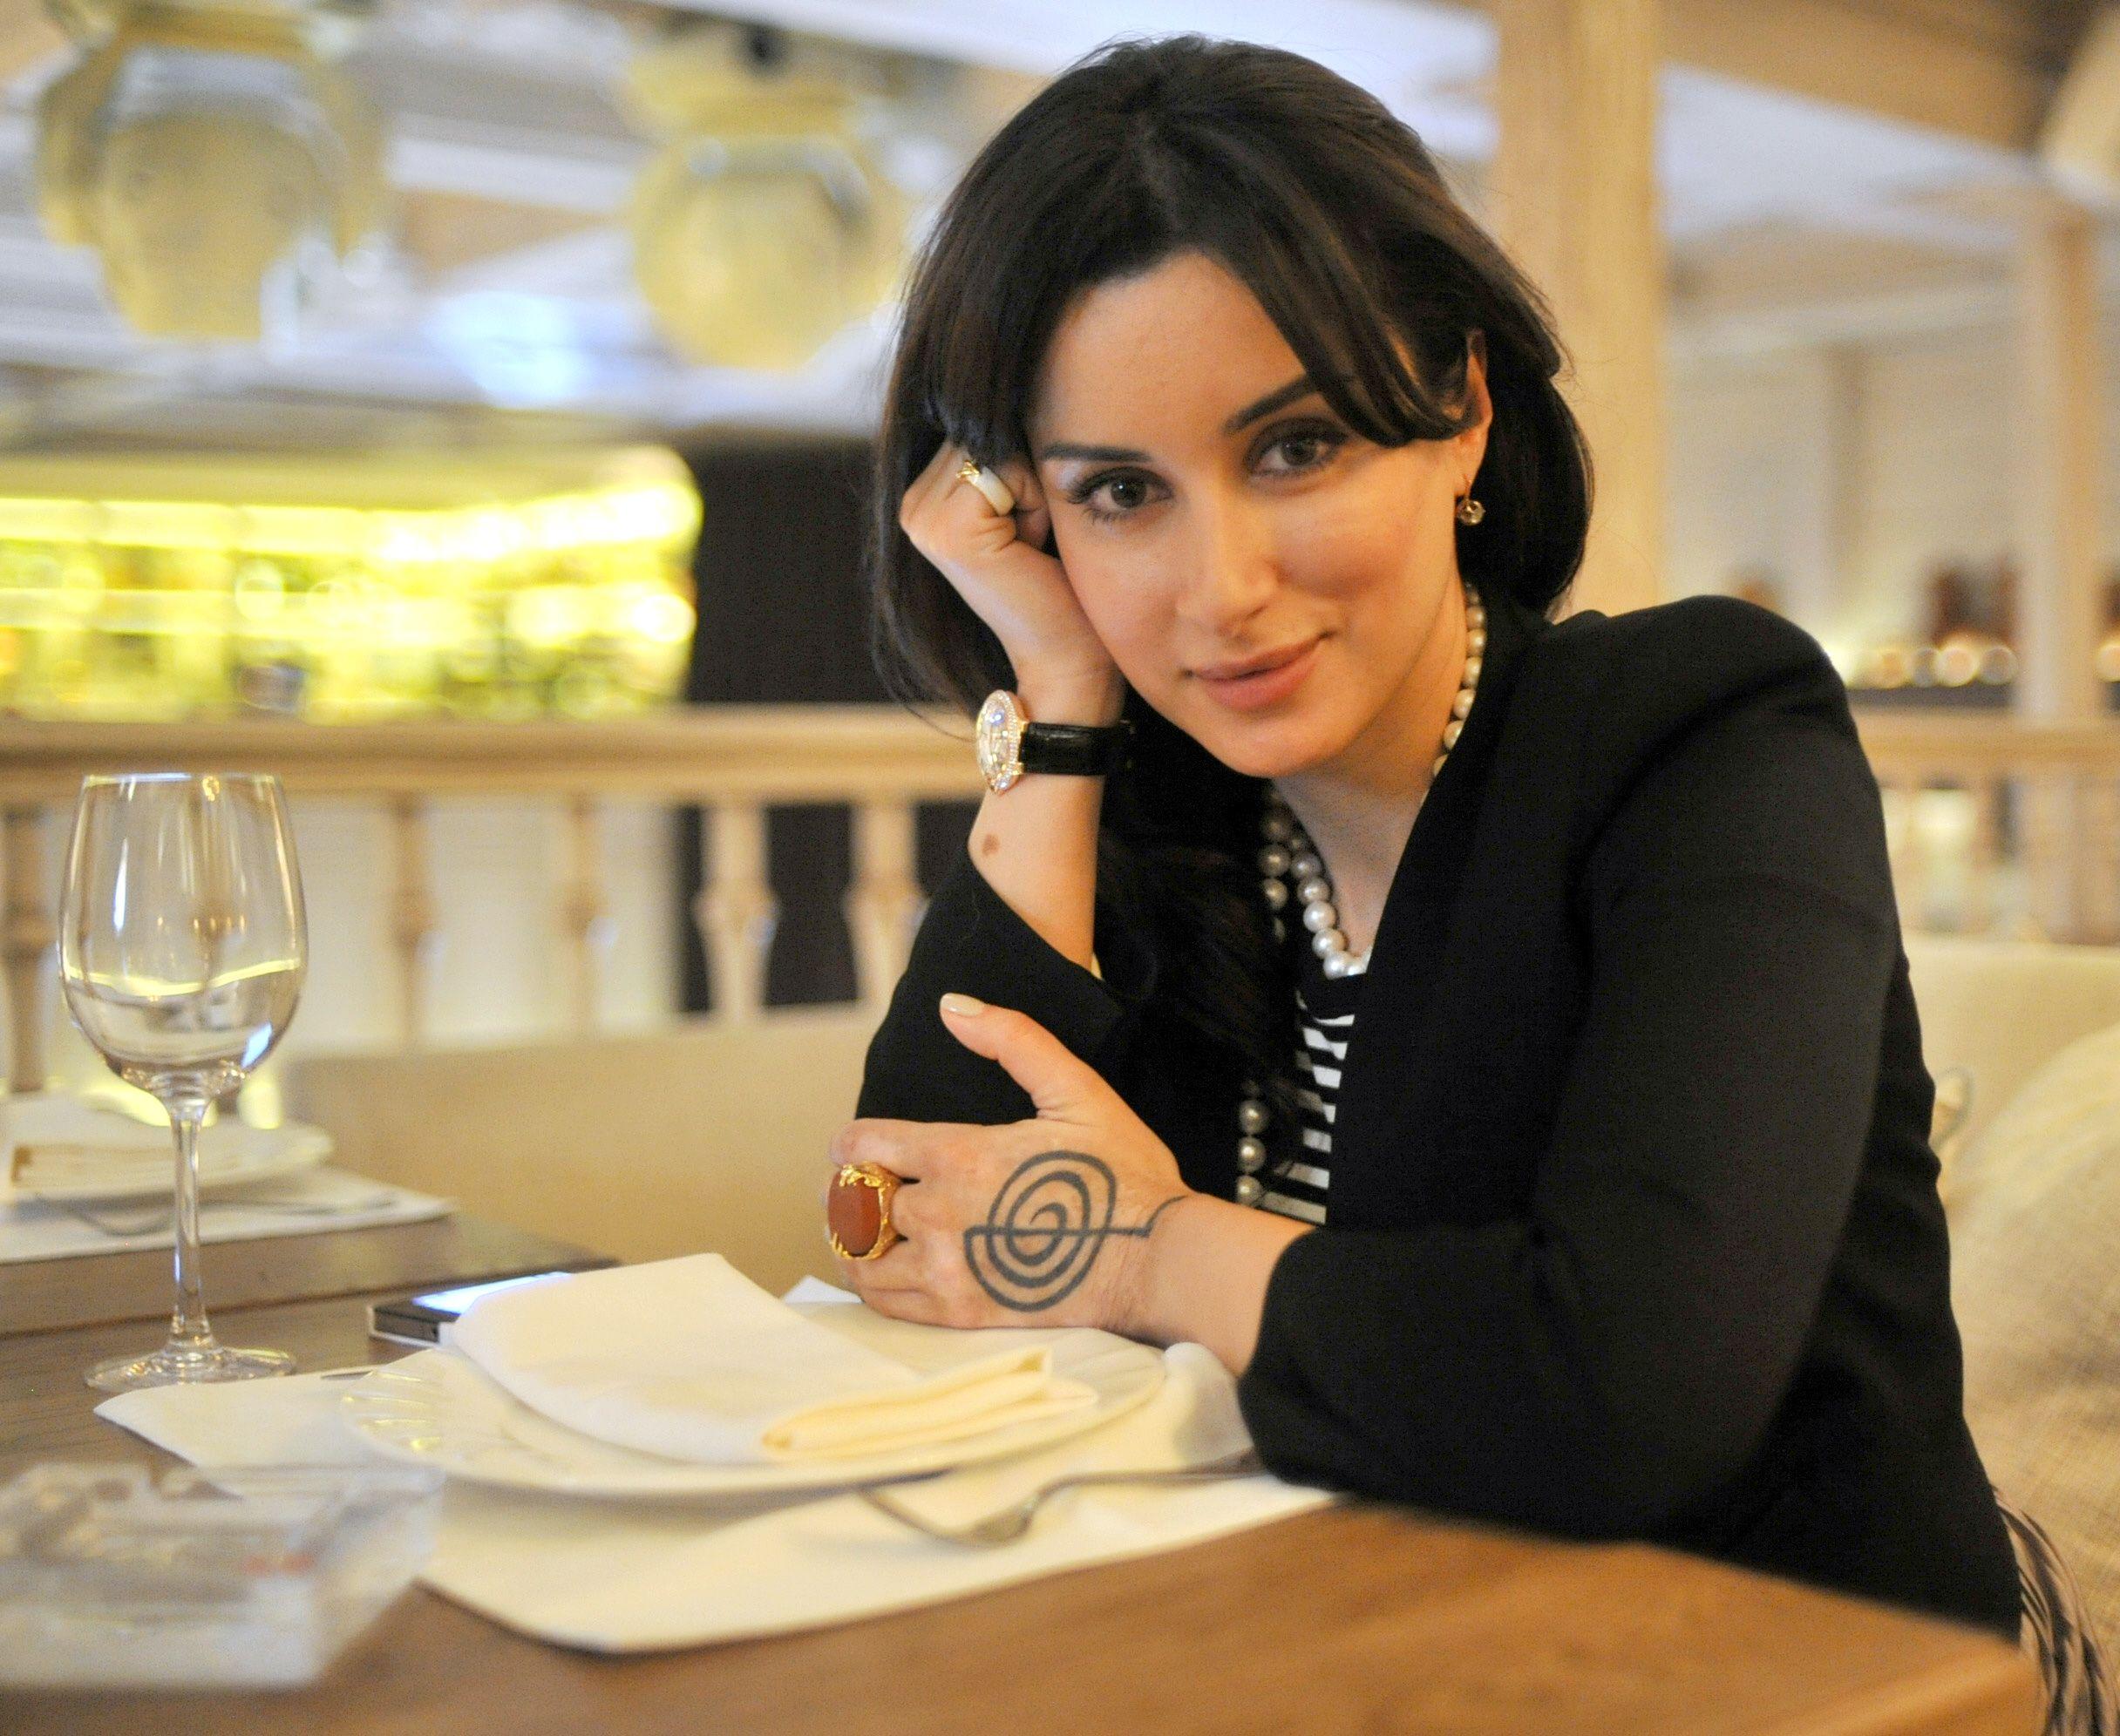 Тина Канделаки: Вернуть мужчину просто